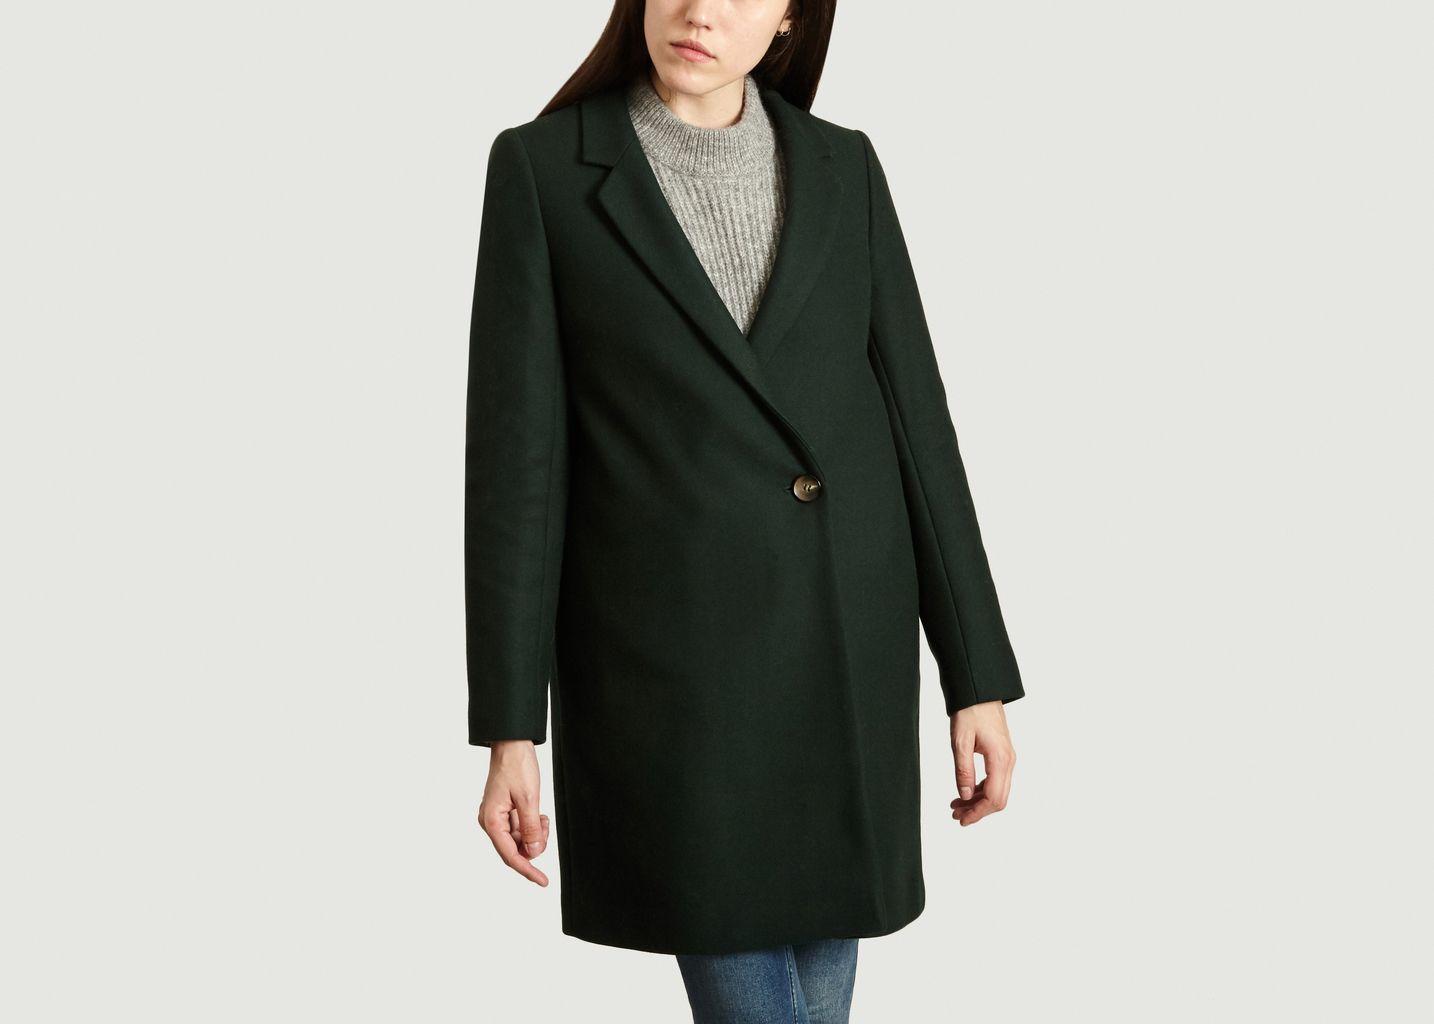 Manteau Droit Vesoul - Trench And Coat